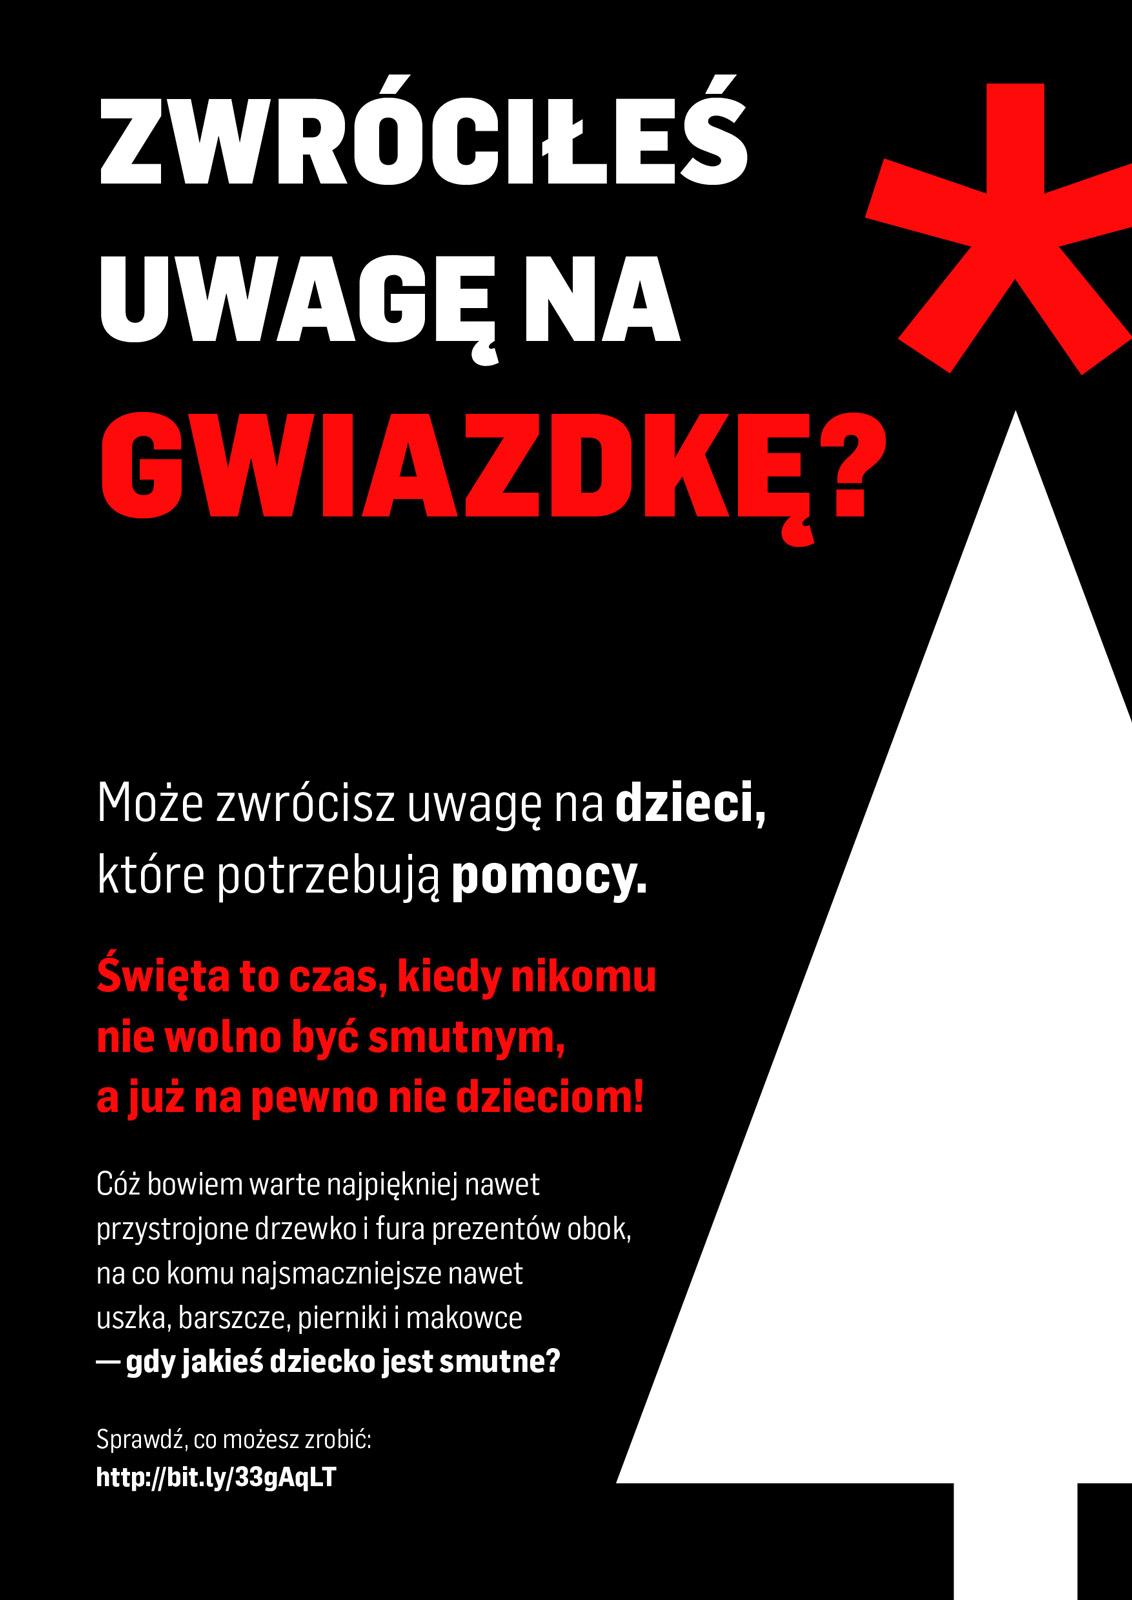 http://m.wm.pl/2019/12/orig/plakat-gwiazdka2-597477.jpg